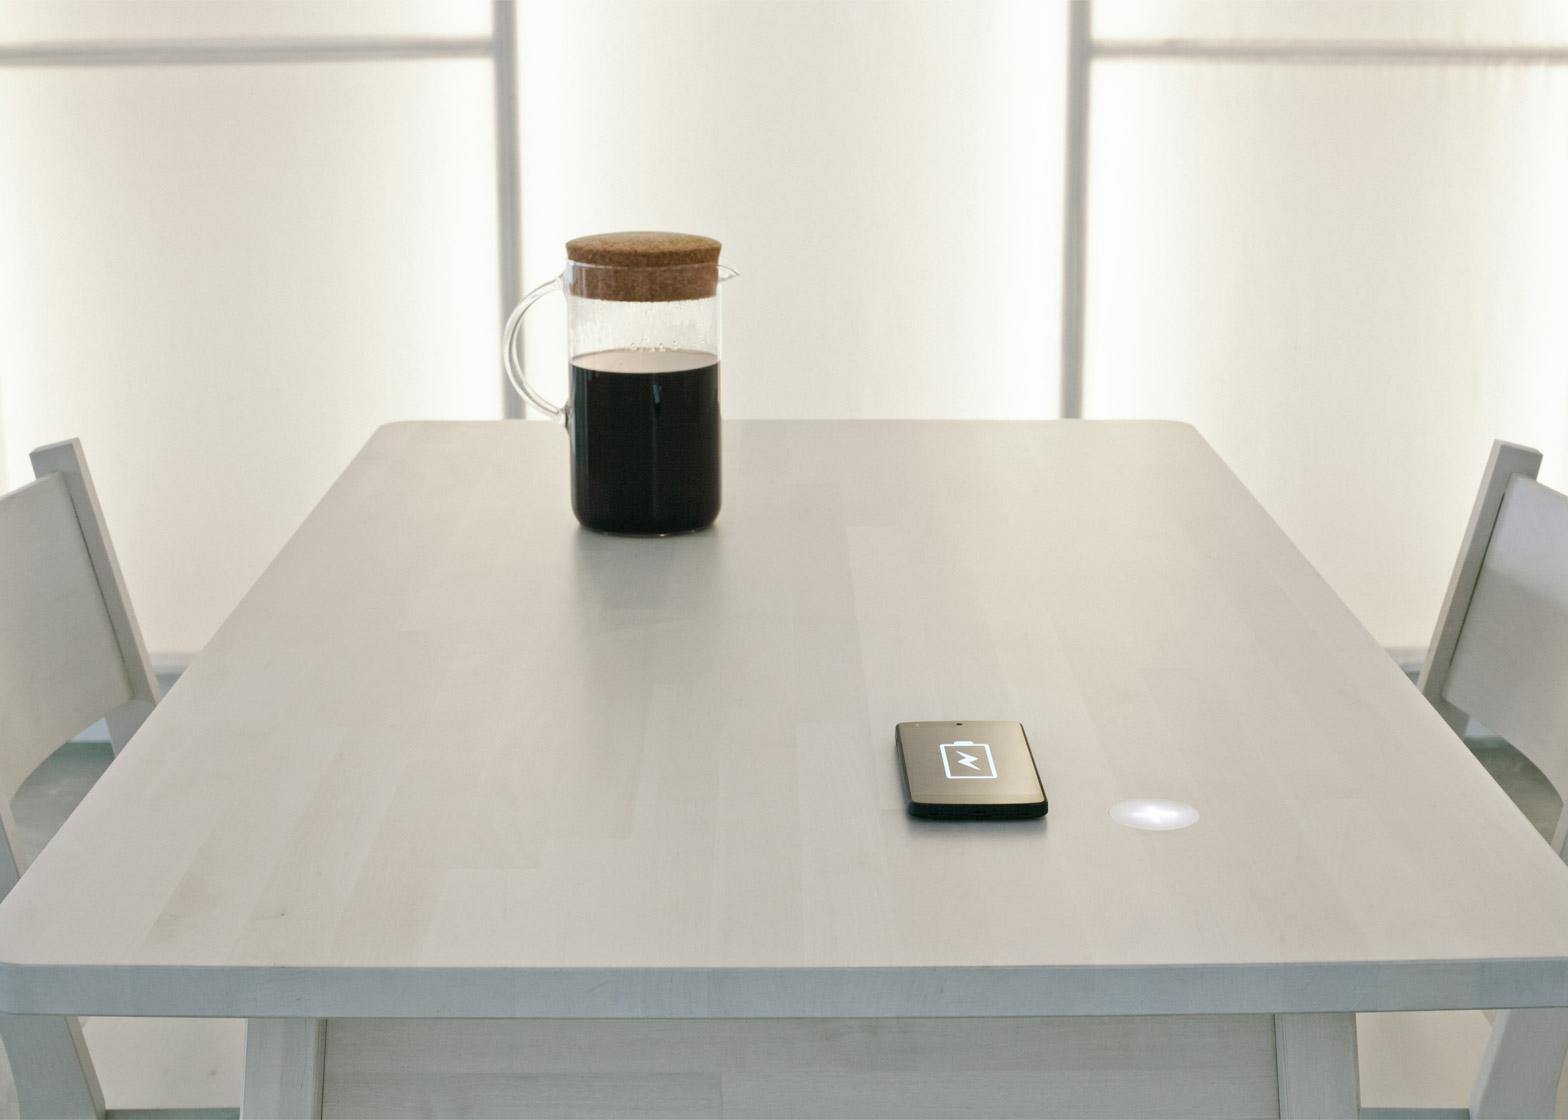 Ikea-Space-10-Innovation-Lab_products_Alastair-Philip-Wiper_dezeen_1568_3